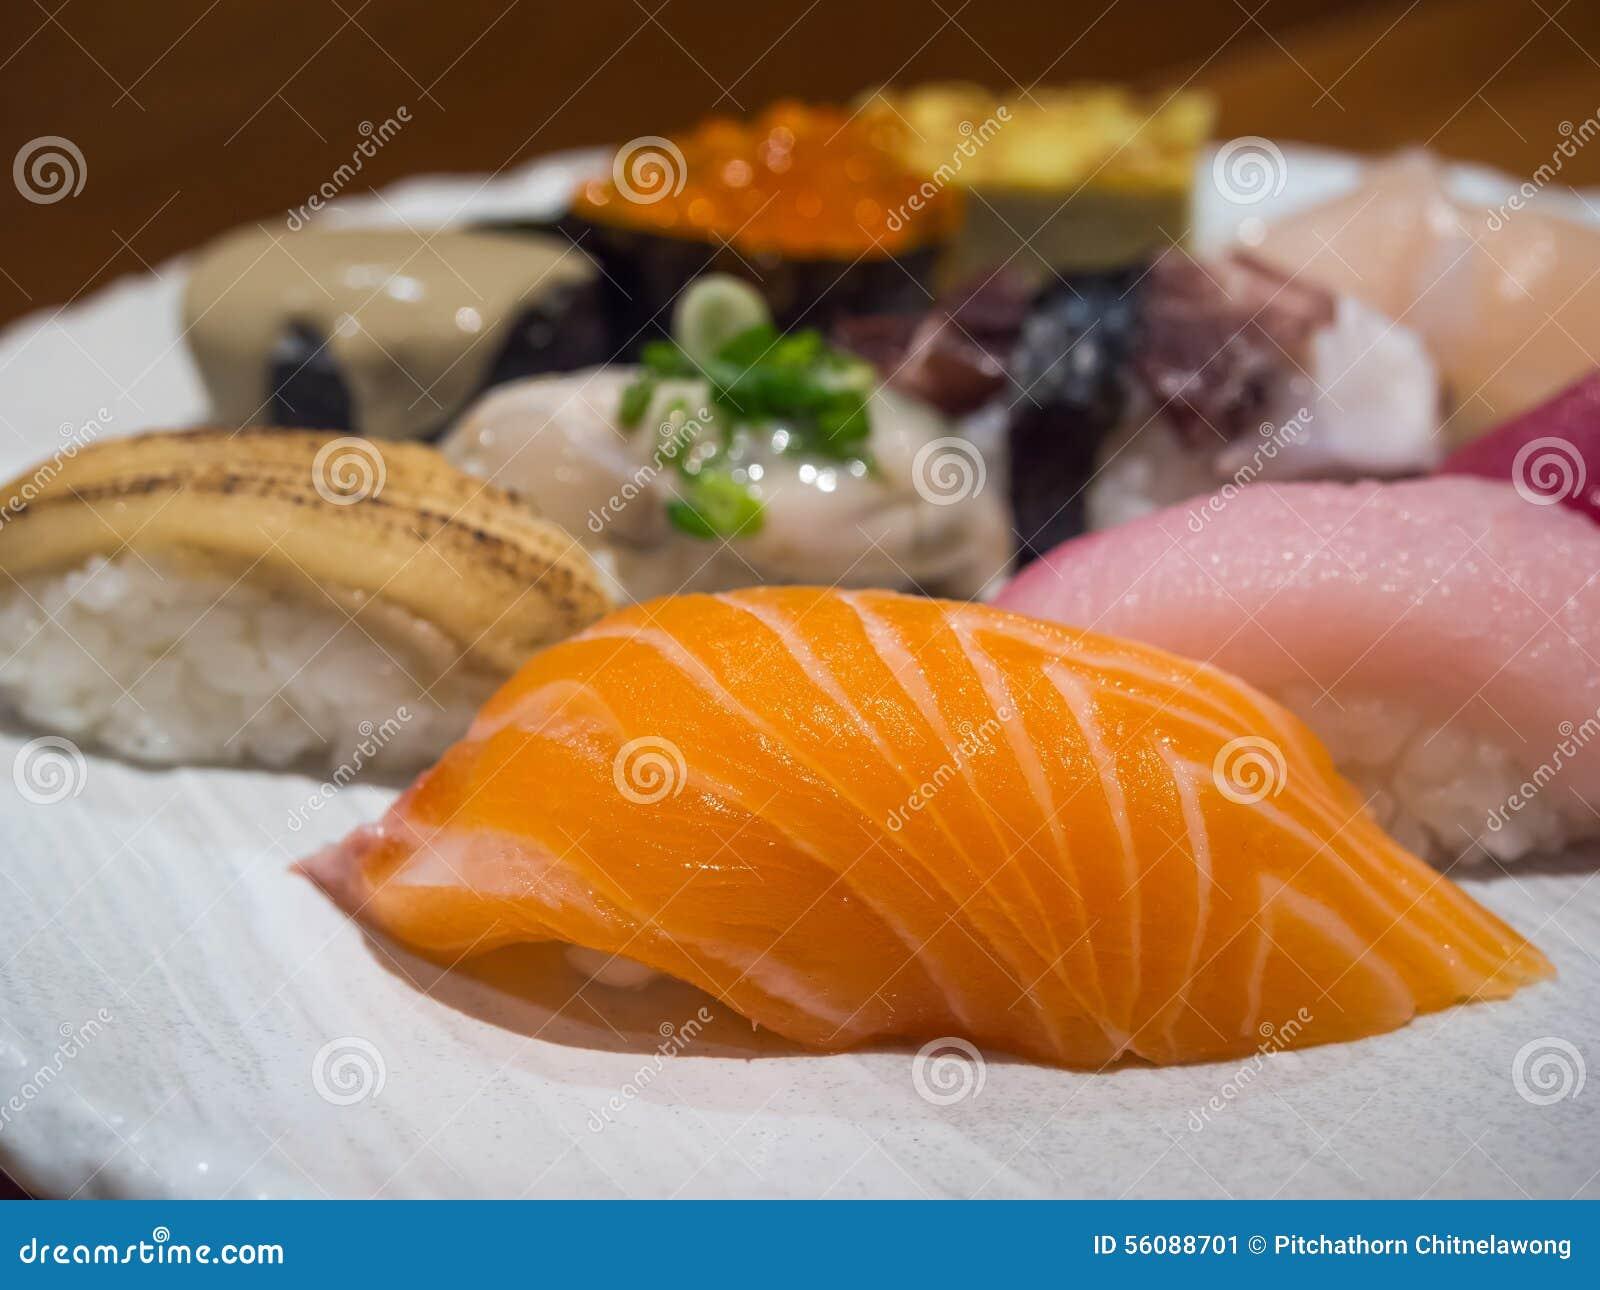 Sushi is luxury japanese food stock photo image 56088701 for Is sushi raw fish